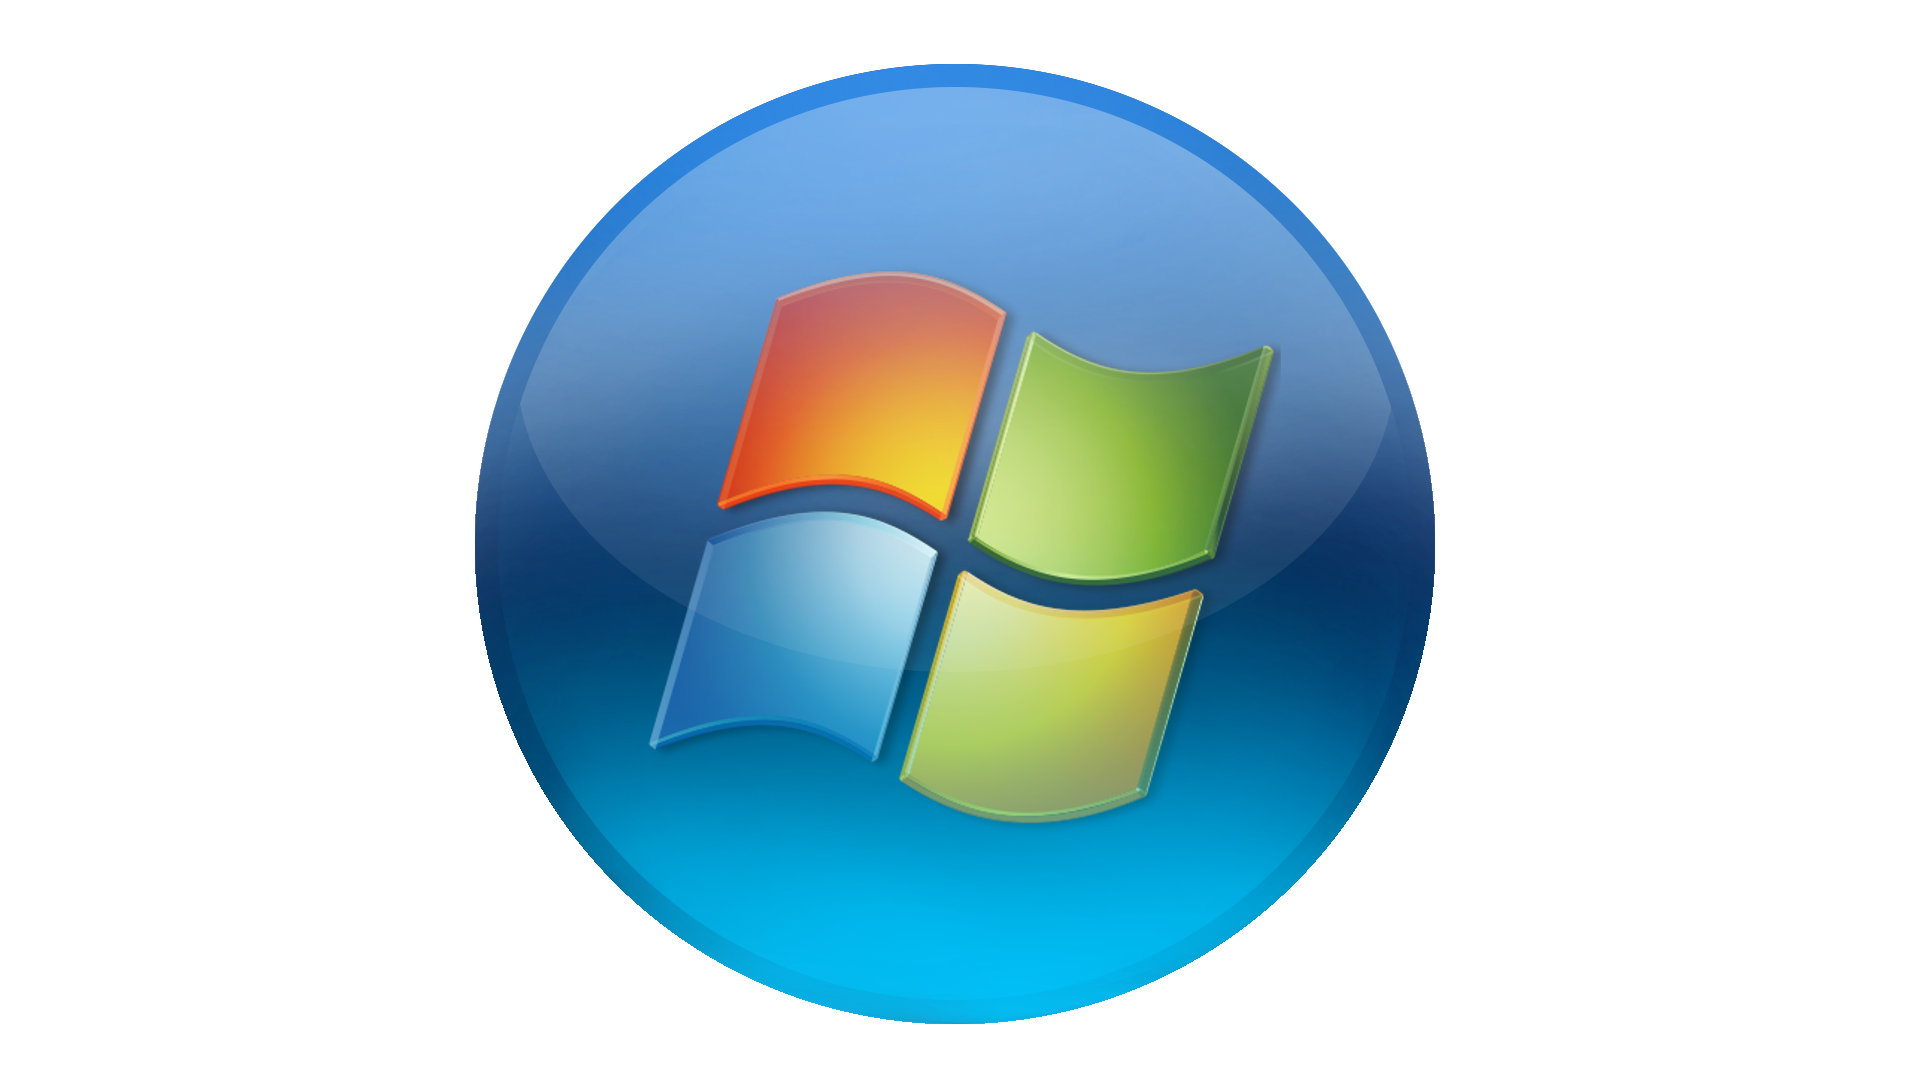 windows vista logo recreation hd by architechi on deviantart